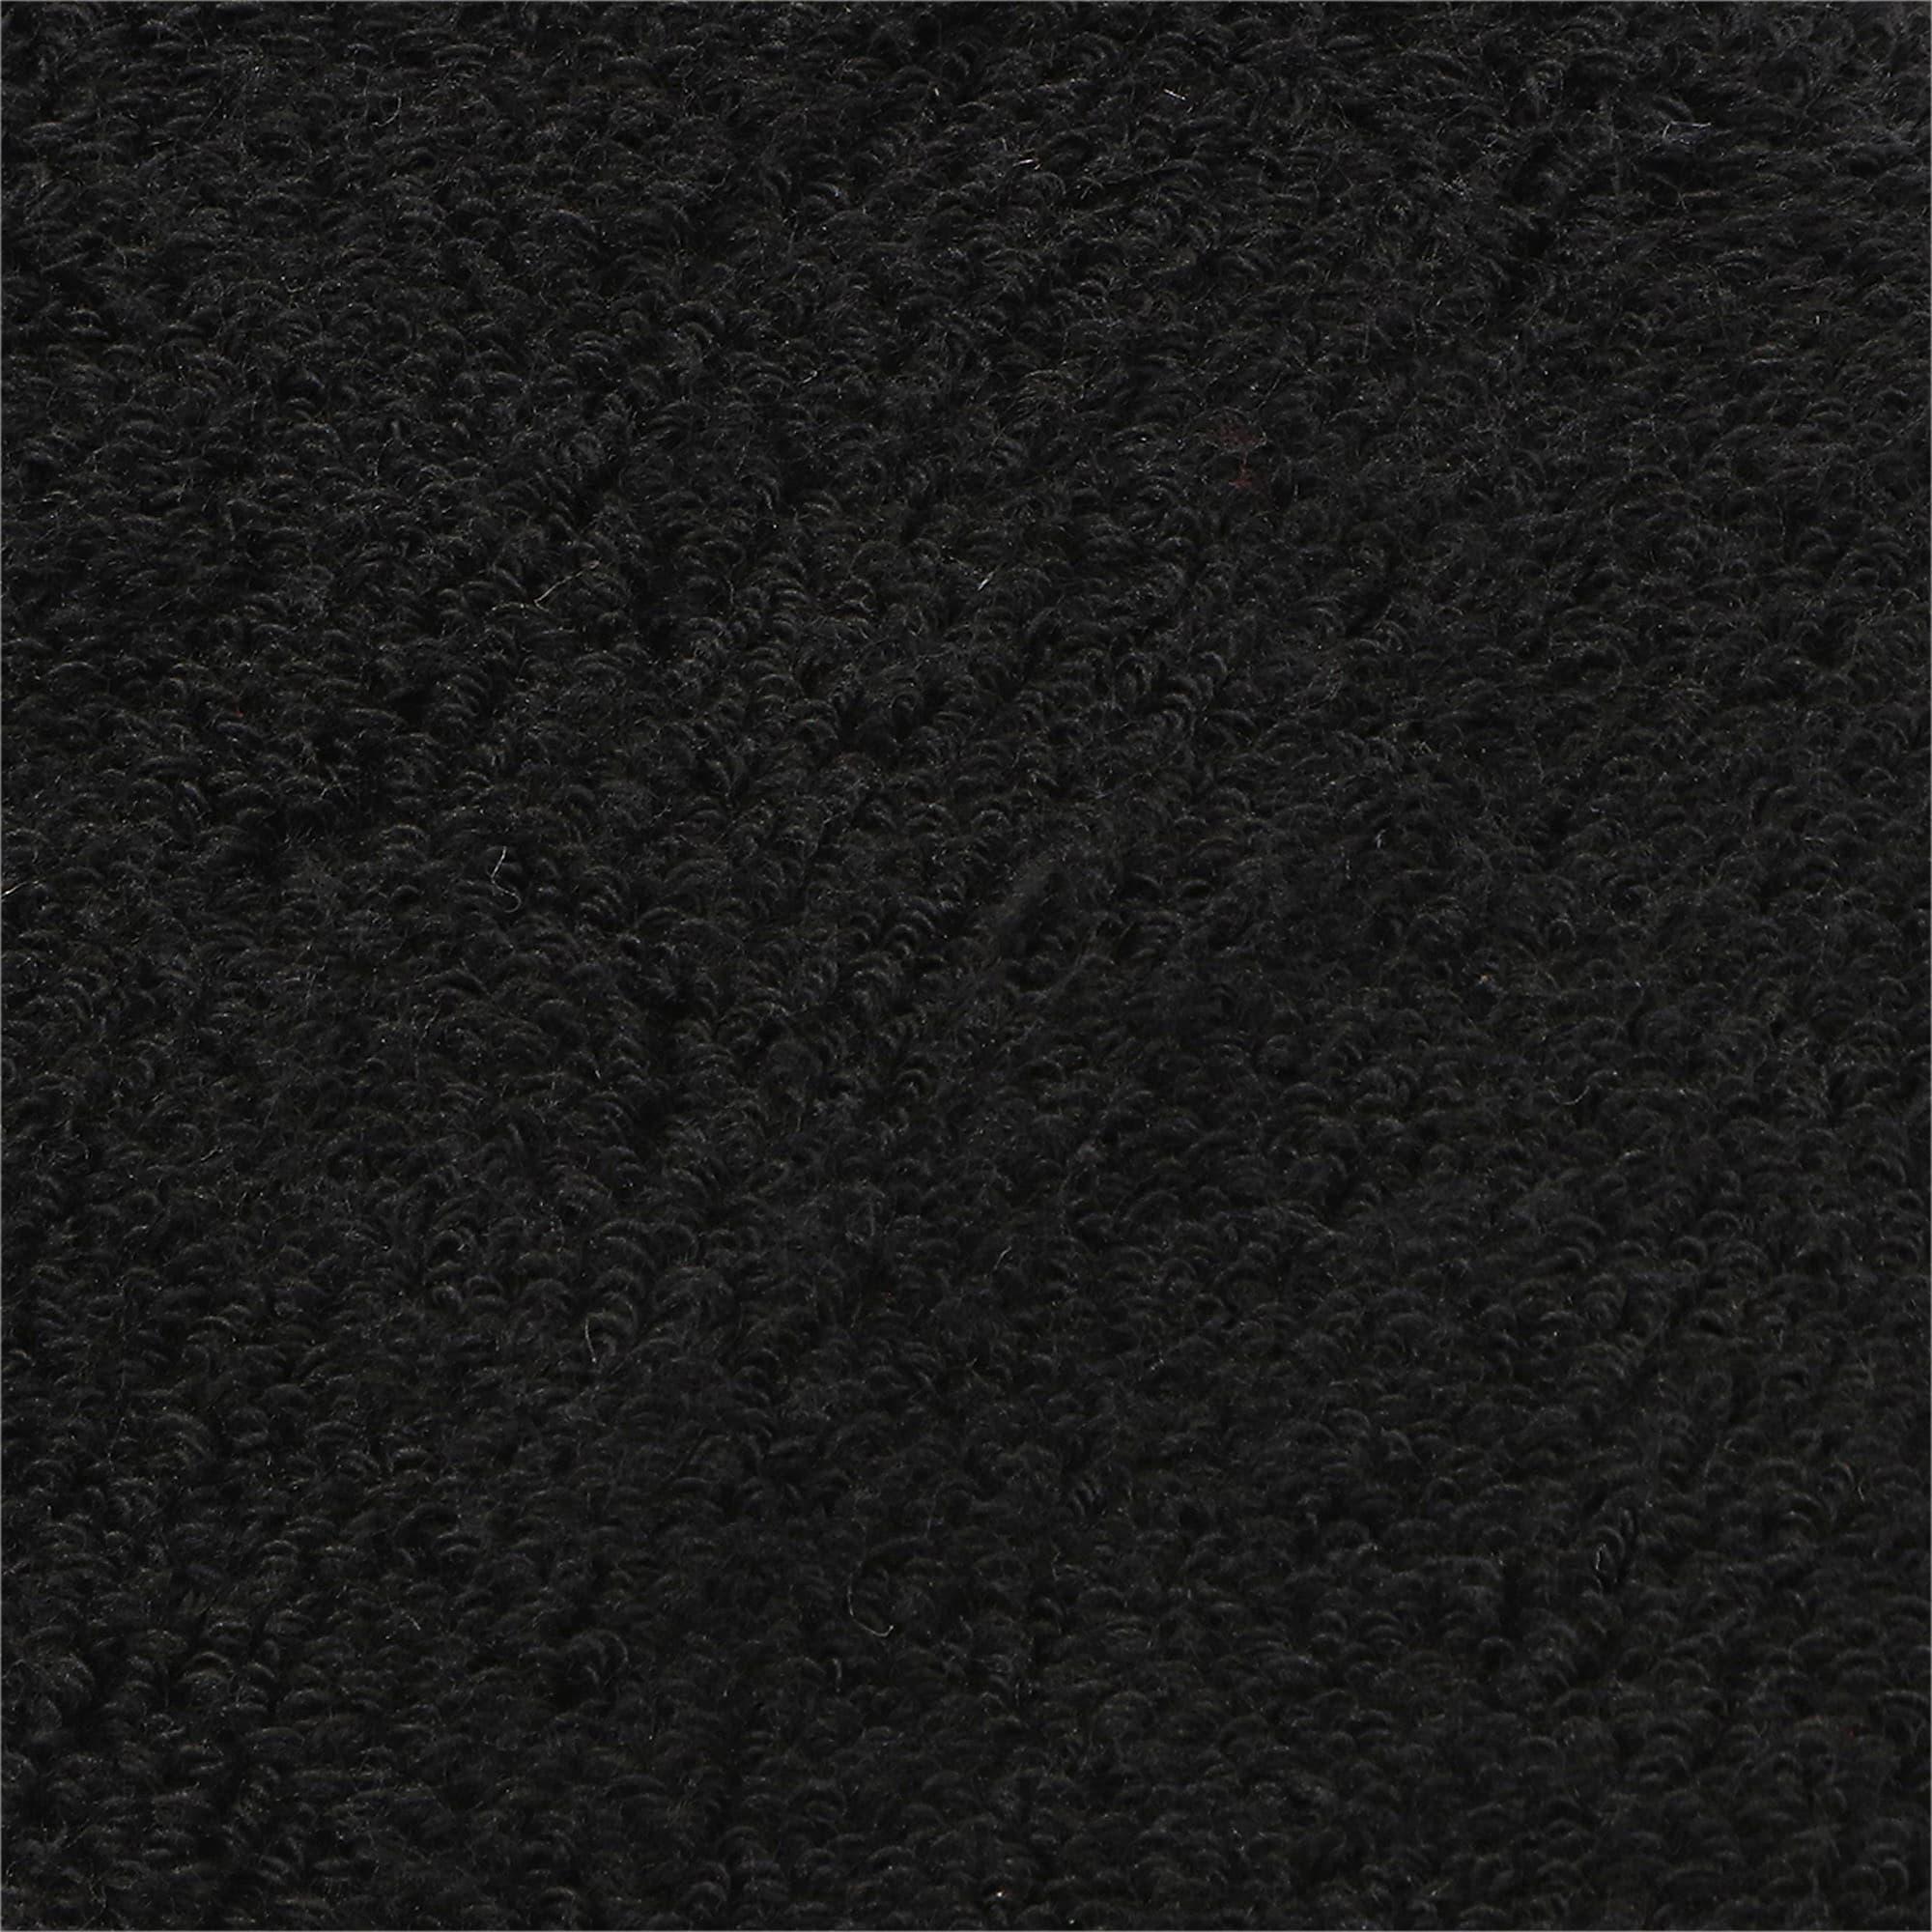 Thumbnail 4 of トレーニング ESS リストバンド クラシック, Puma Black, medium-JPN